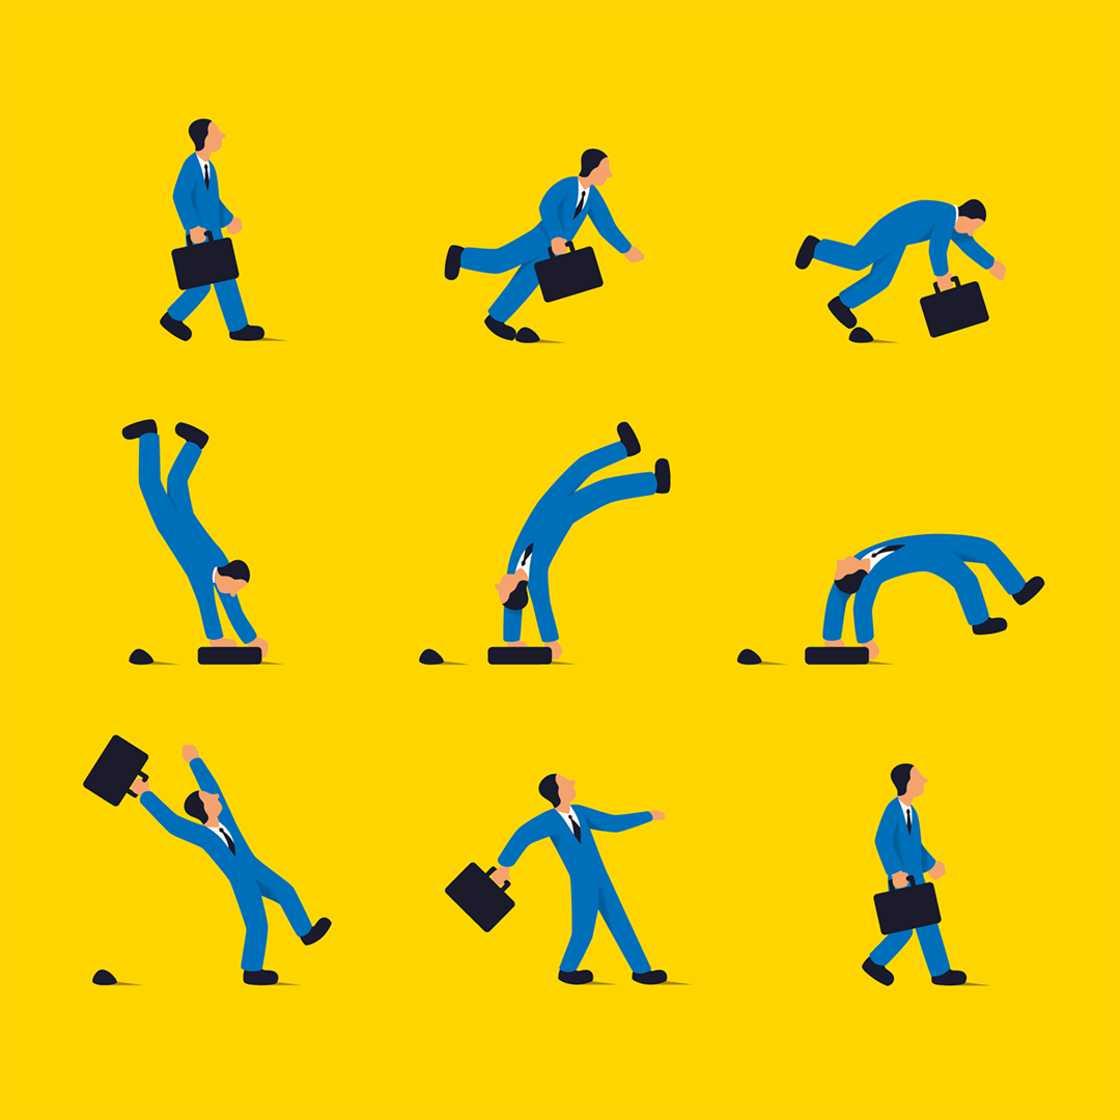 The satirical and minimalist illustrations of Francesco Ciccolella